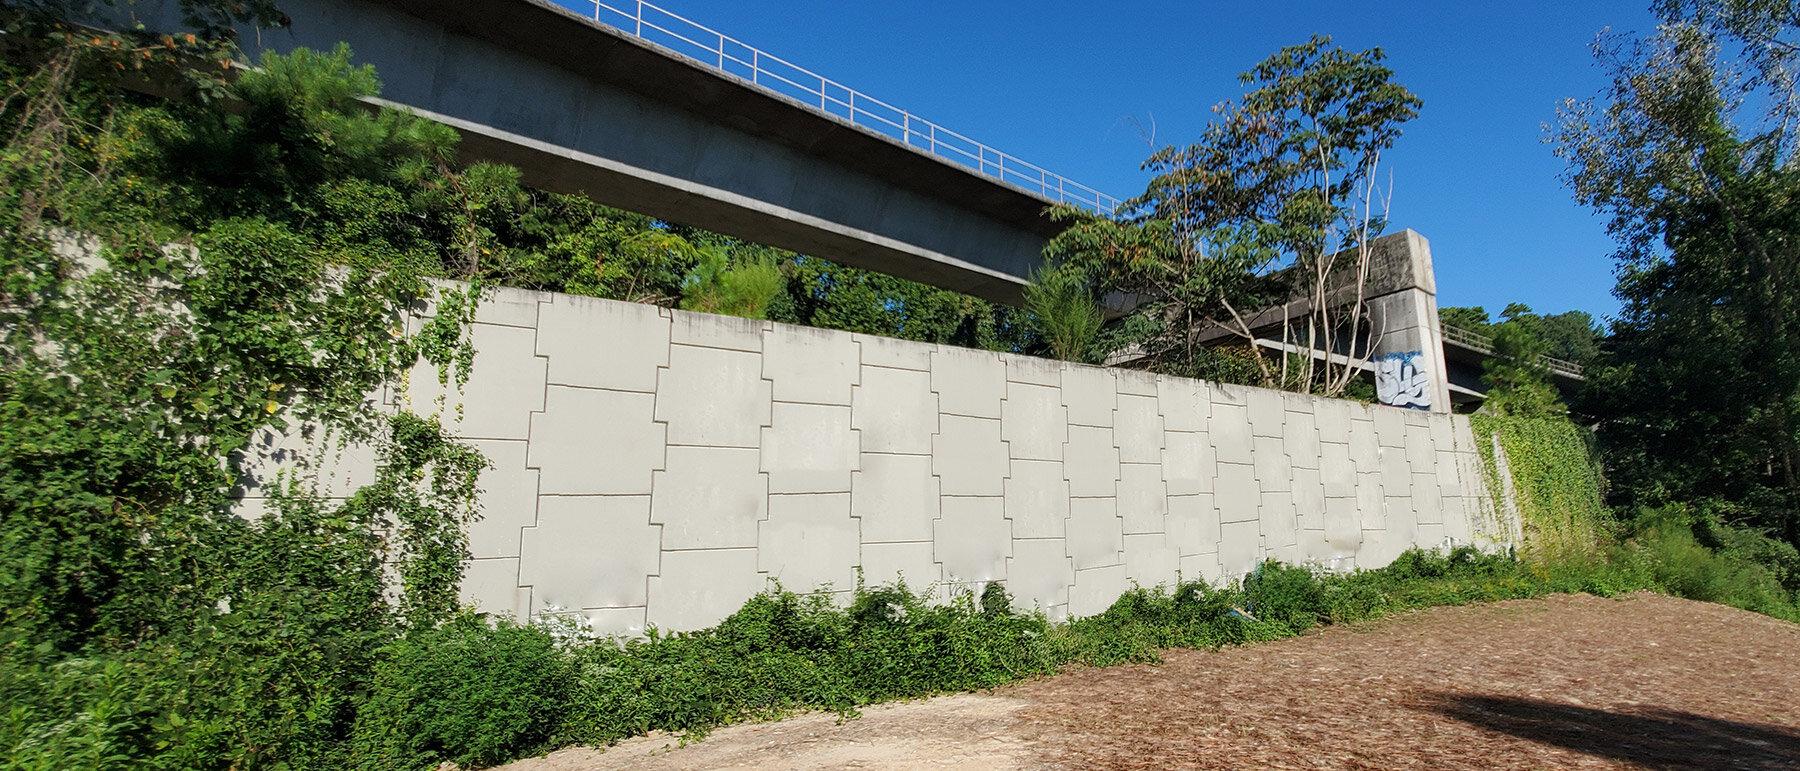 path400-wall-web.jpg